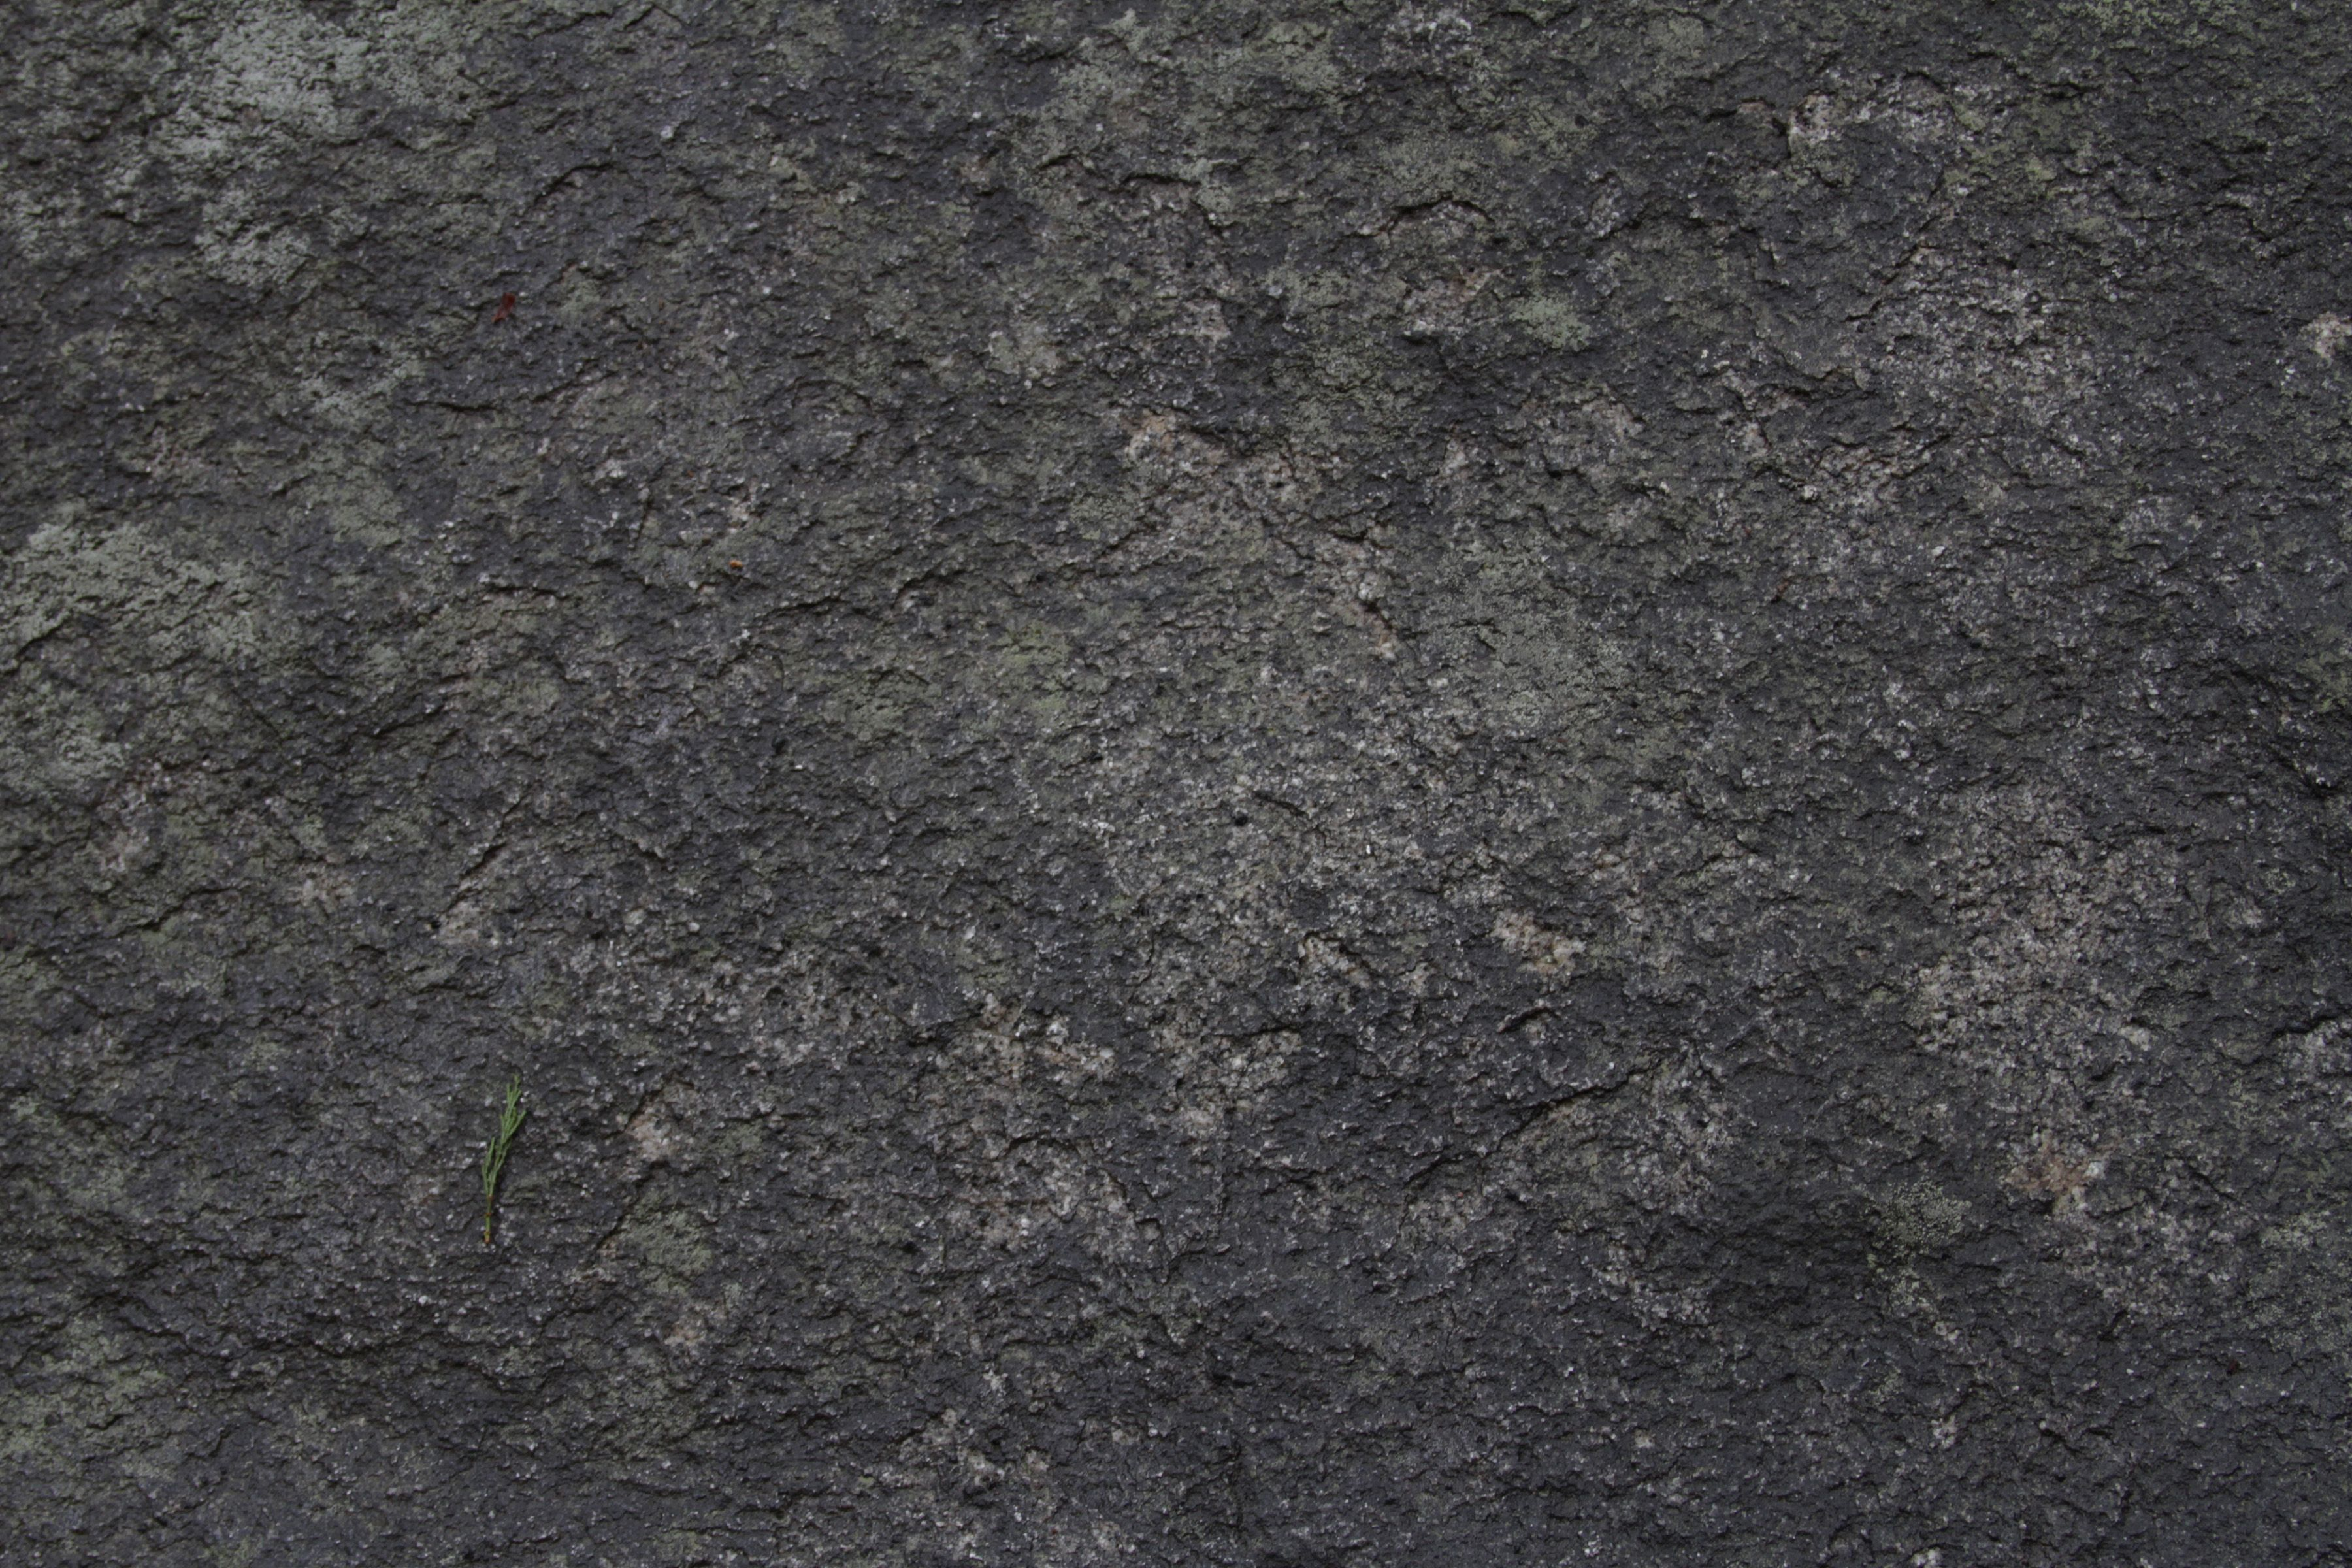 Charcoal Stone Texture 14textures Campcomputer Explainer Pinterest Interiors